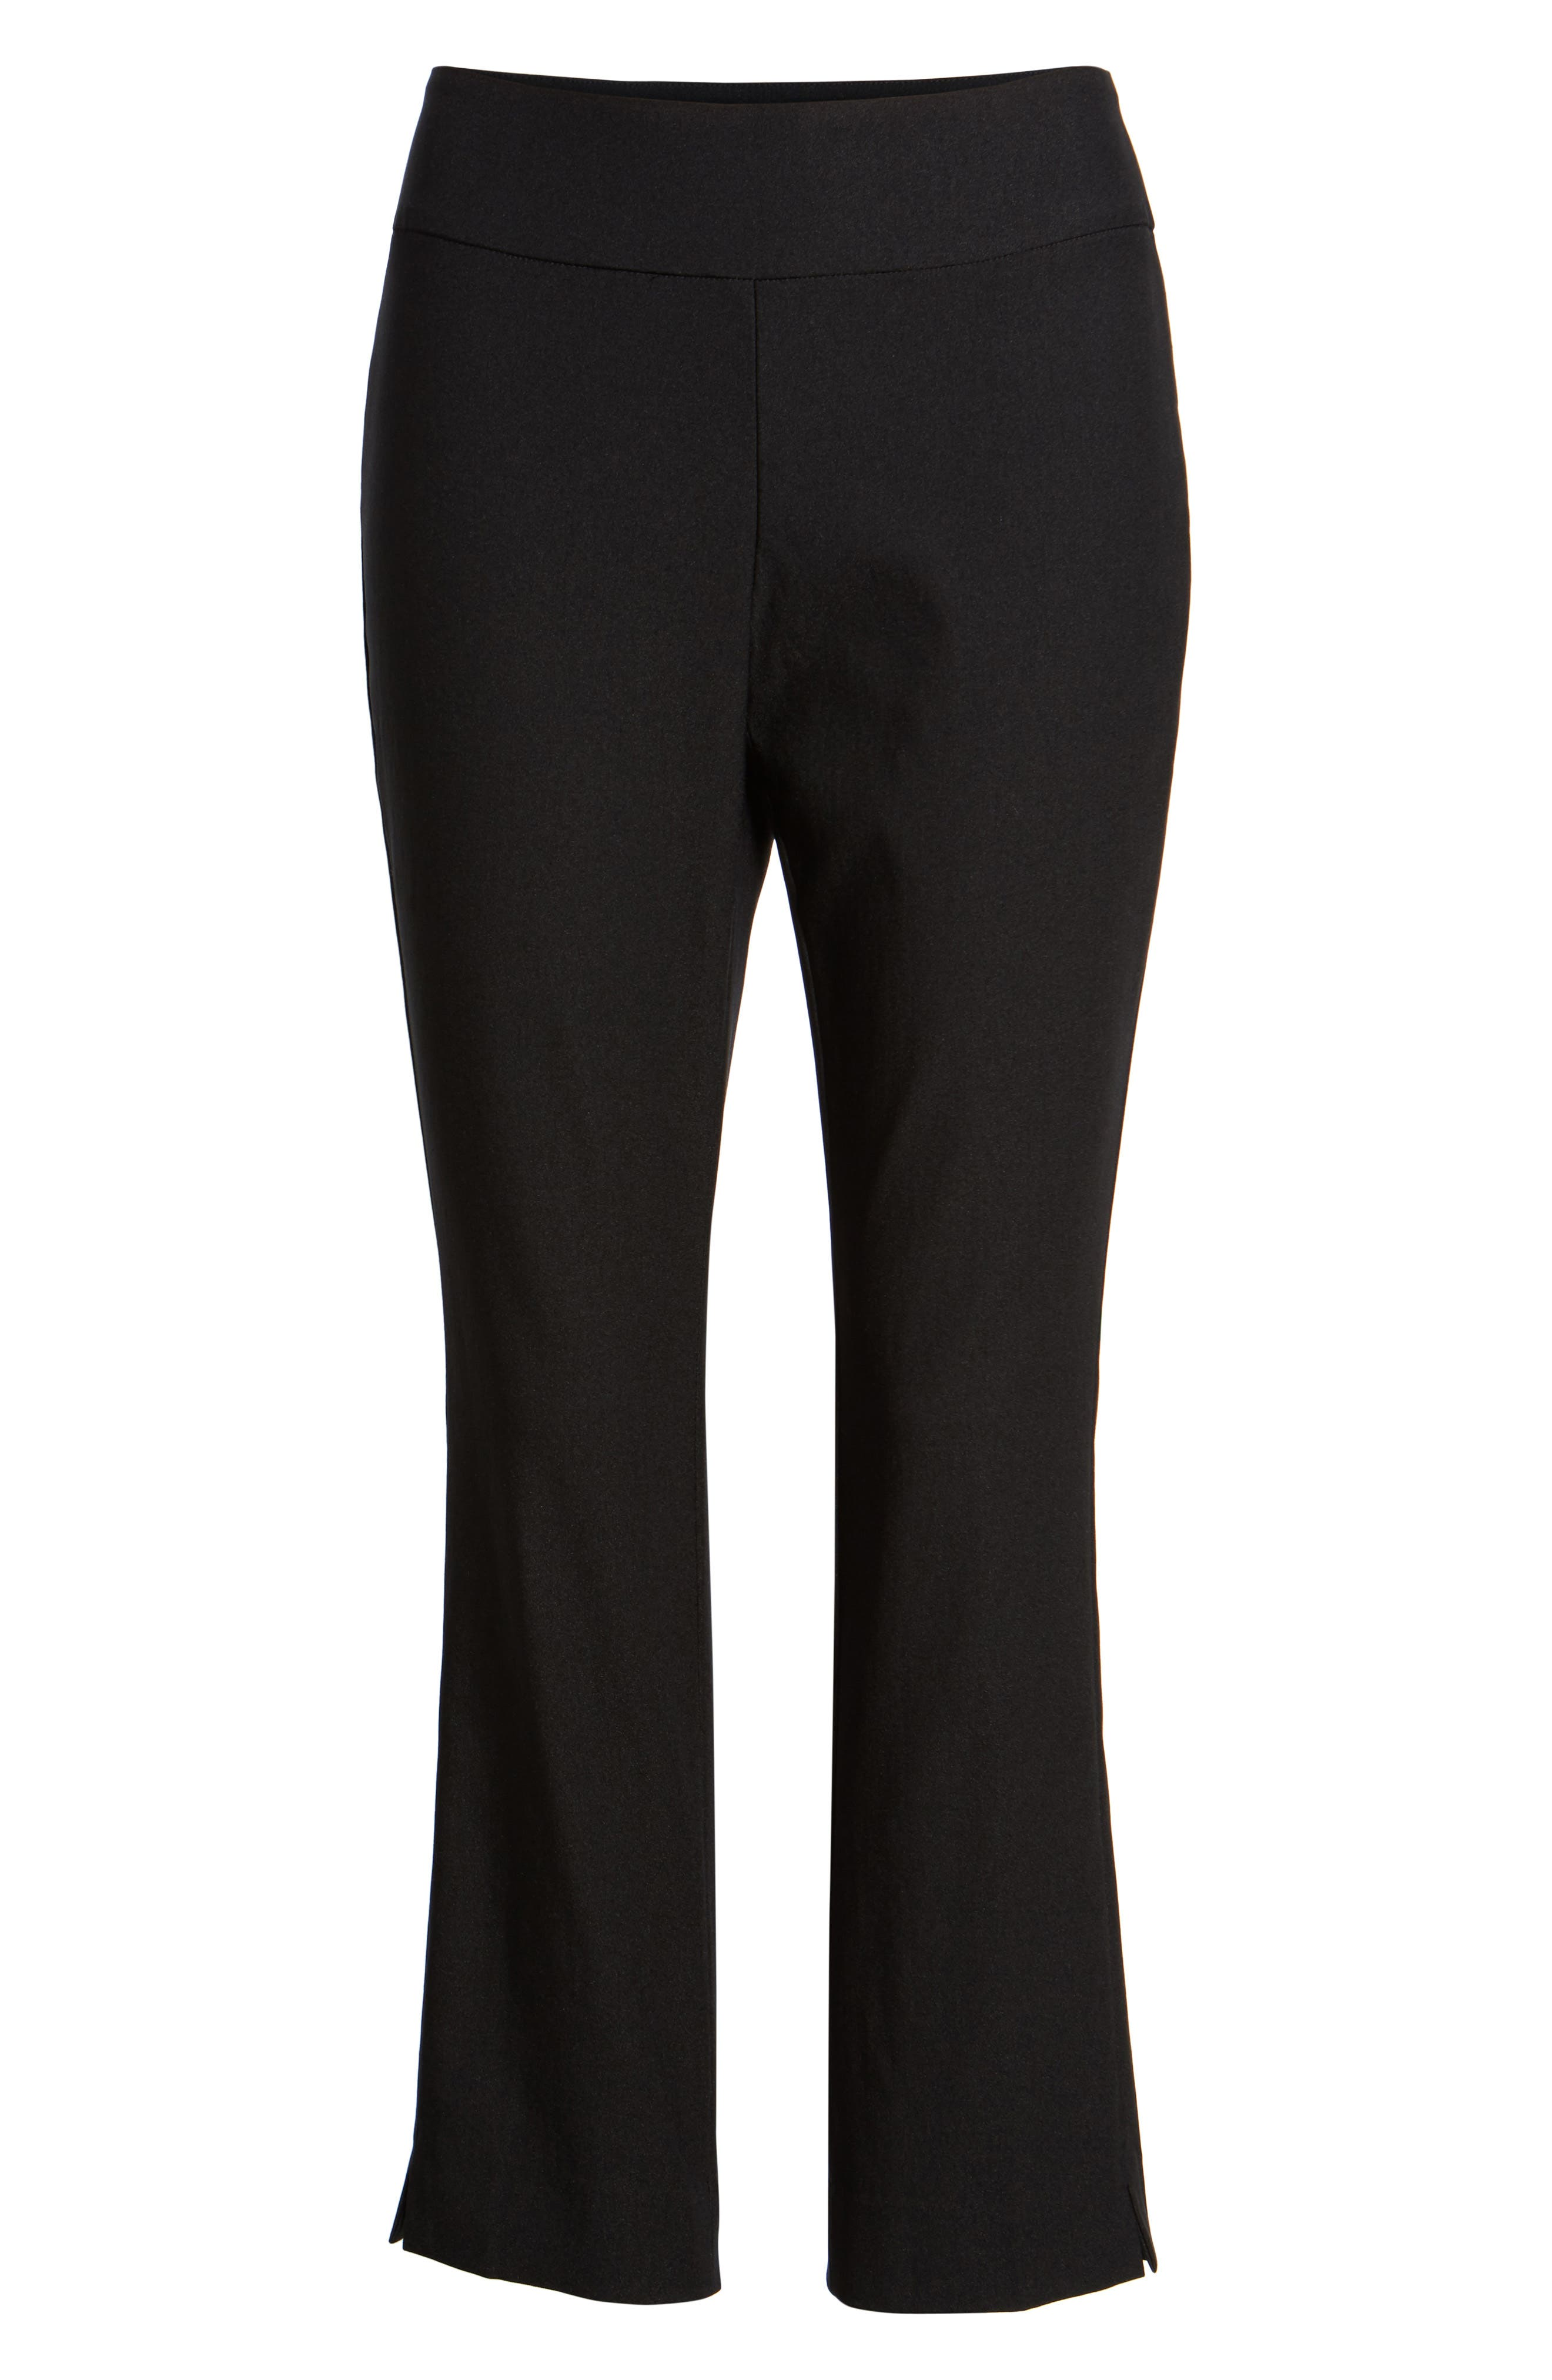 Wonder Stretch Crop Pants,                             Alternate thumbnail 6, color,                             BLACK ONYX